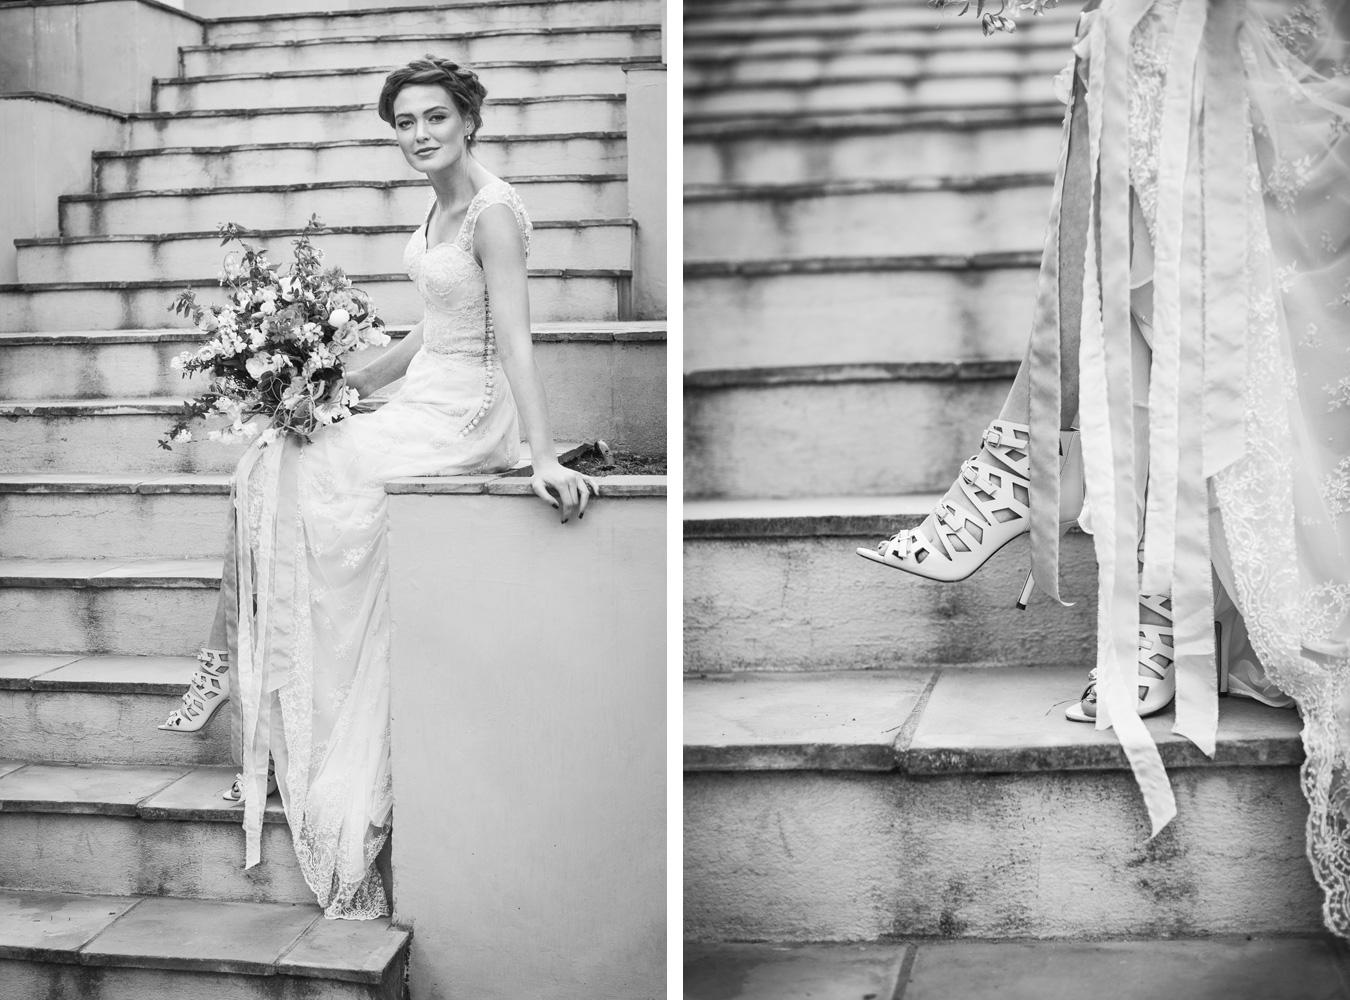 025-fotograf-tone-tvedt-bryllup-i-utlandet.jpg